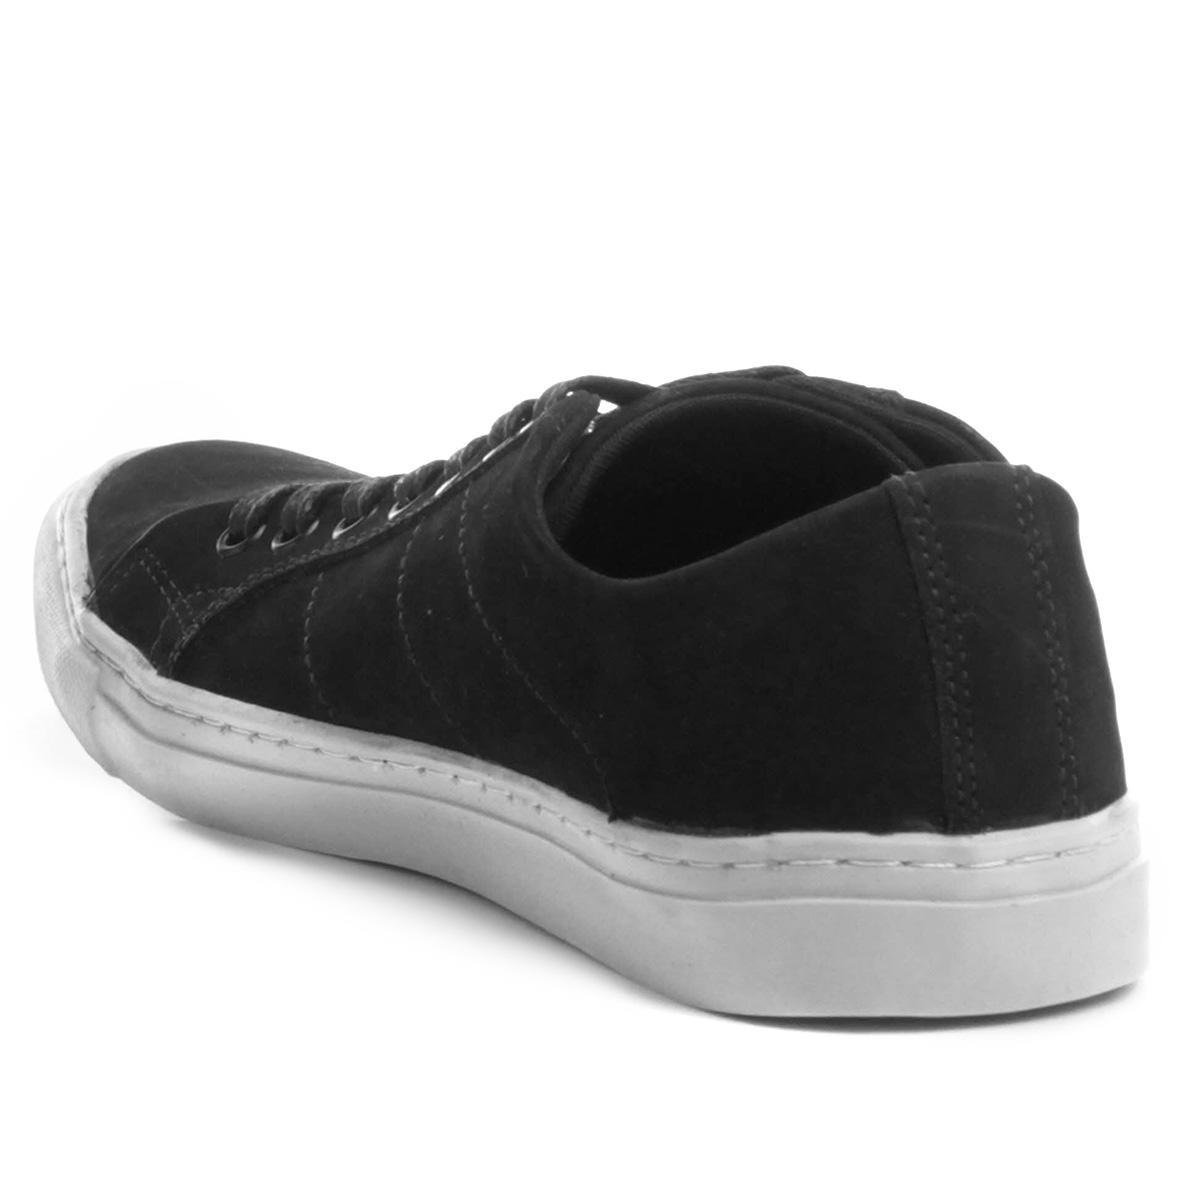 8a3c753959 sapatênis couro shoestock nobuck color masculino. Carregando zoom.